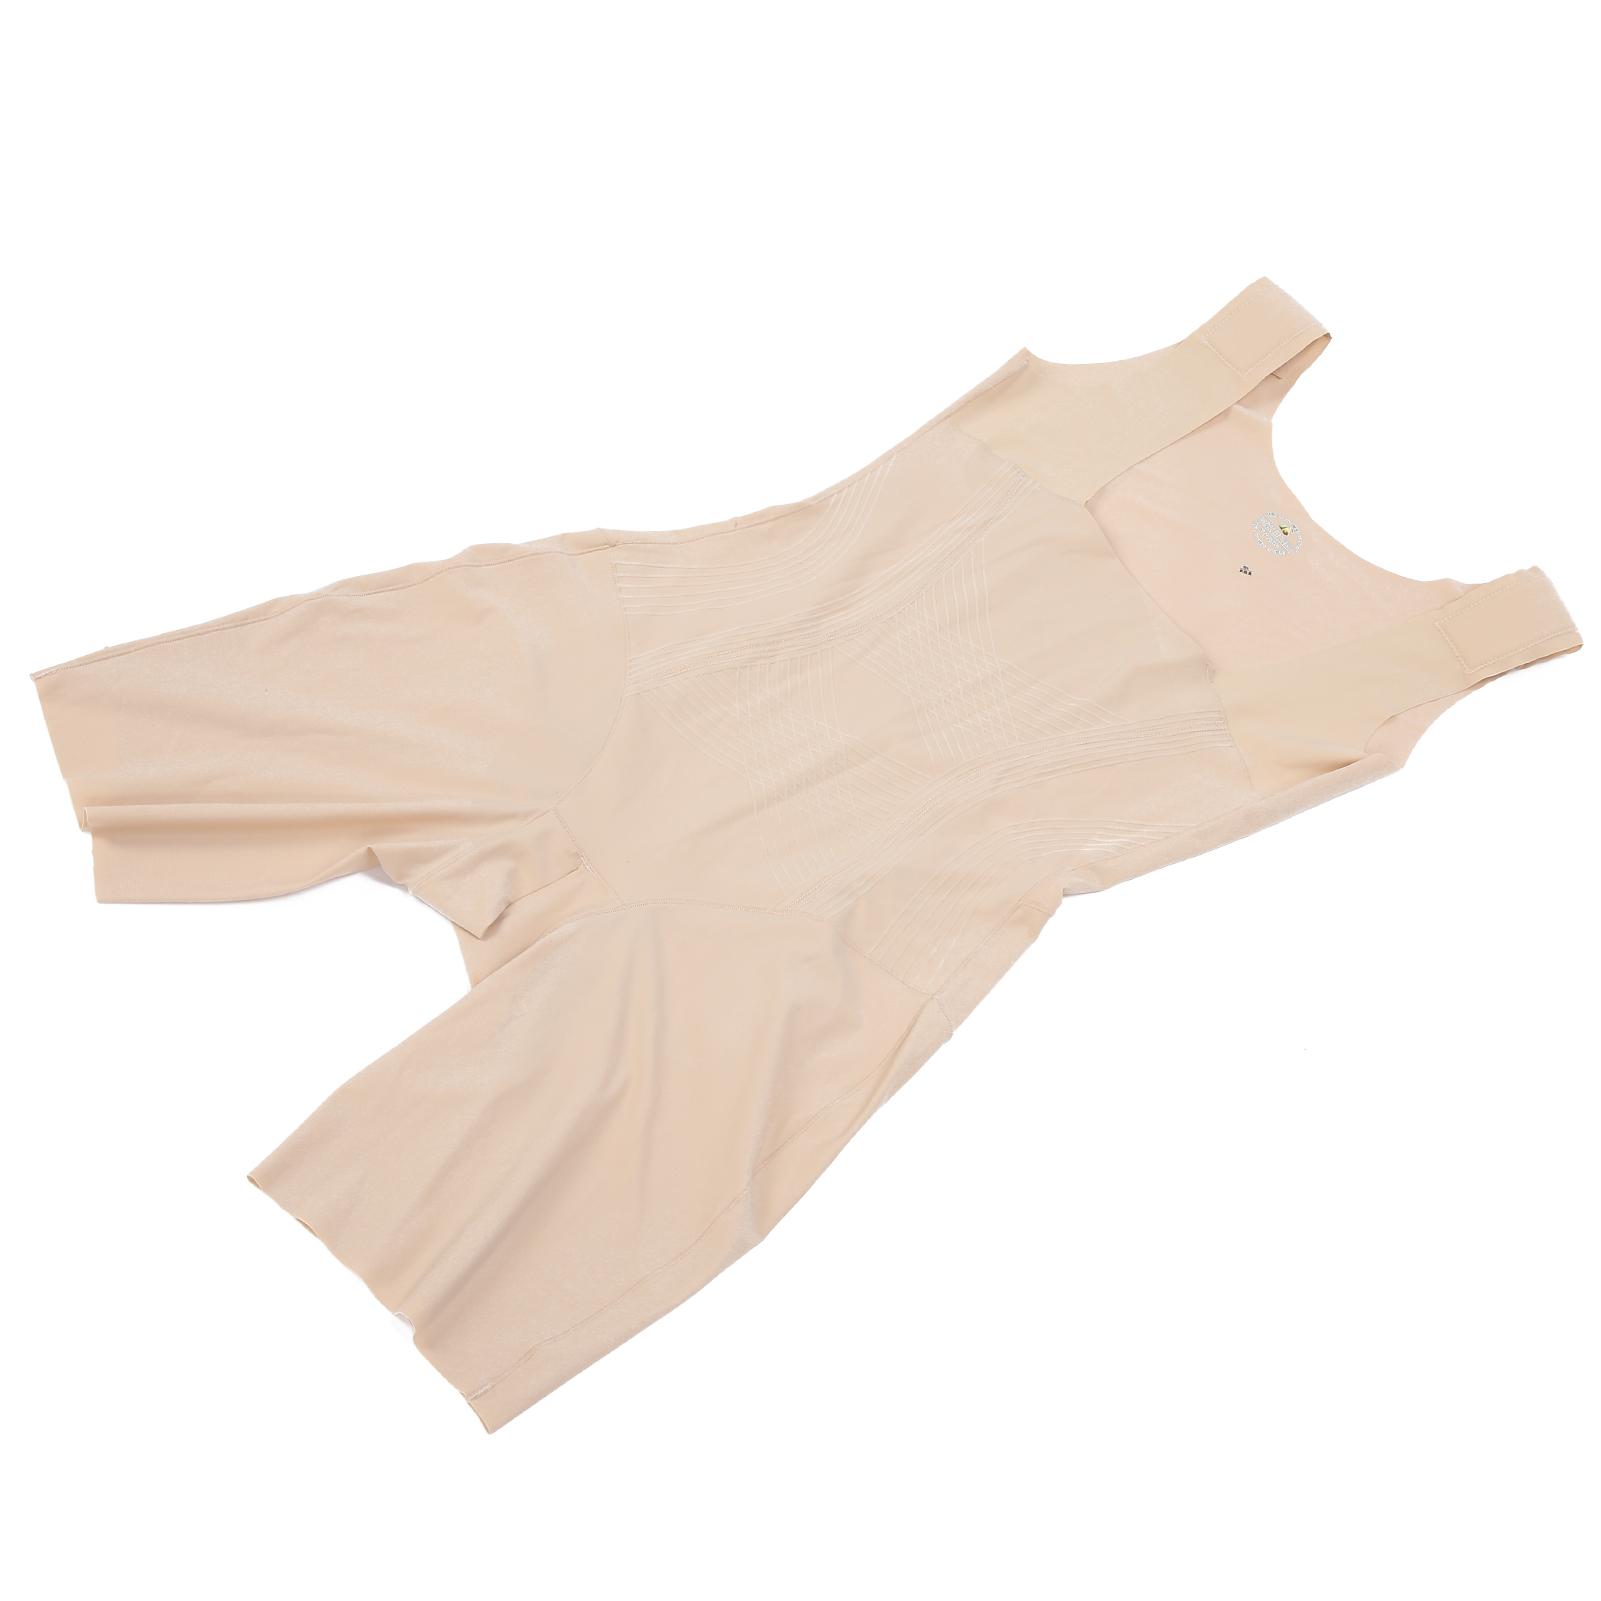 miniature 27 - Women's Full Body Taille Trainer Shaper Taille Corset underbust corset shapewear